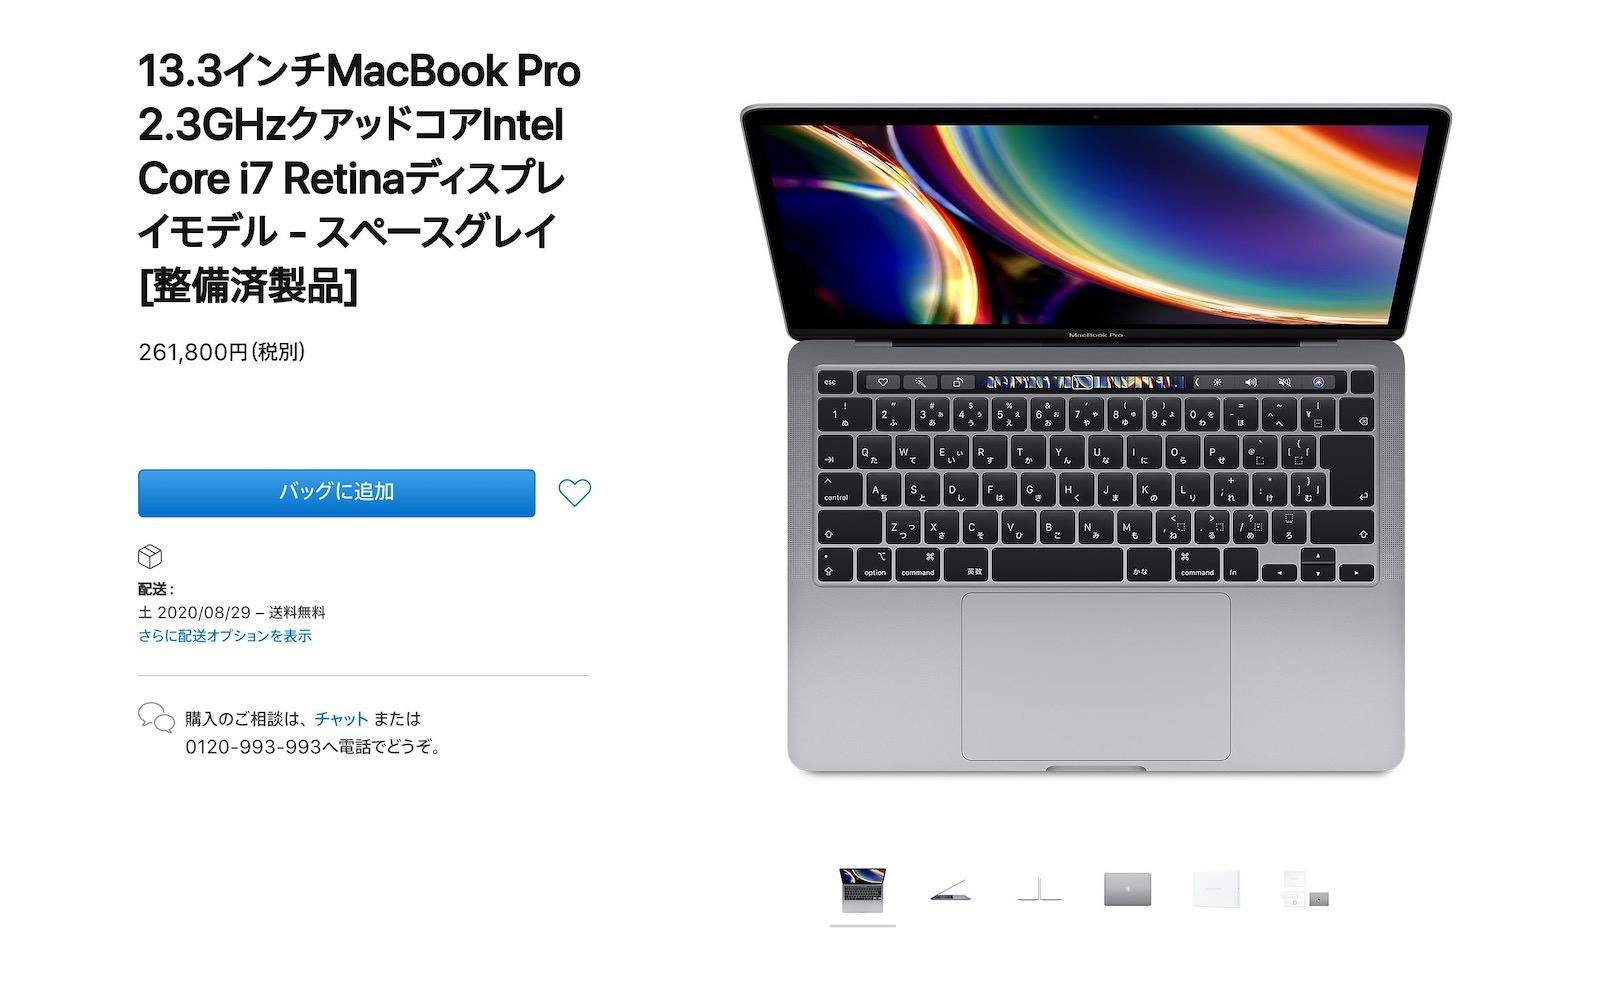 Ram 32gb macbookpro 2020 refurbished